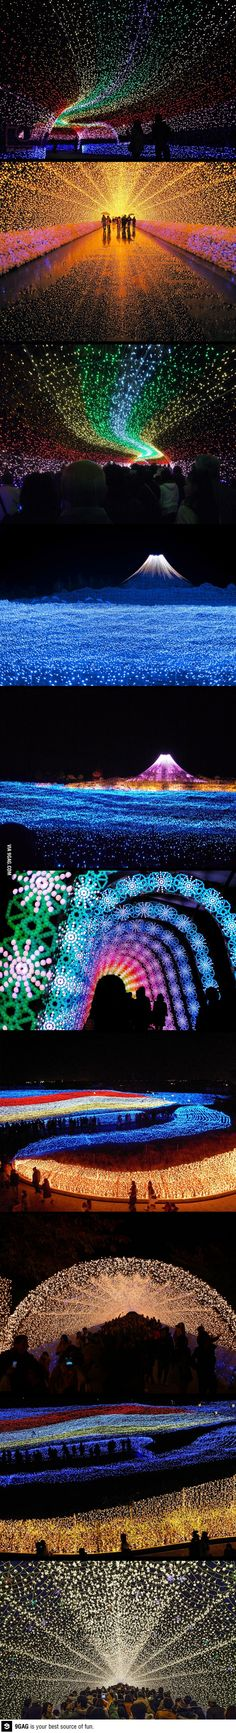 Light installation..Winter light festival in japan, made from 7 million LEDs